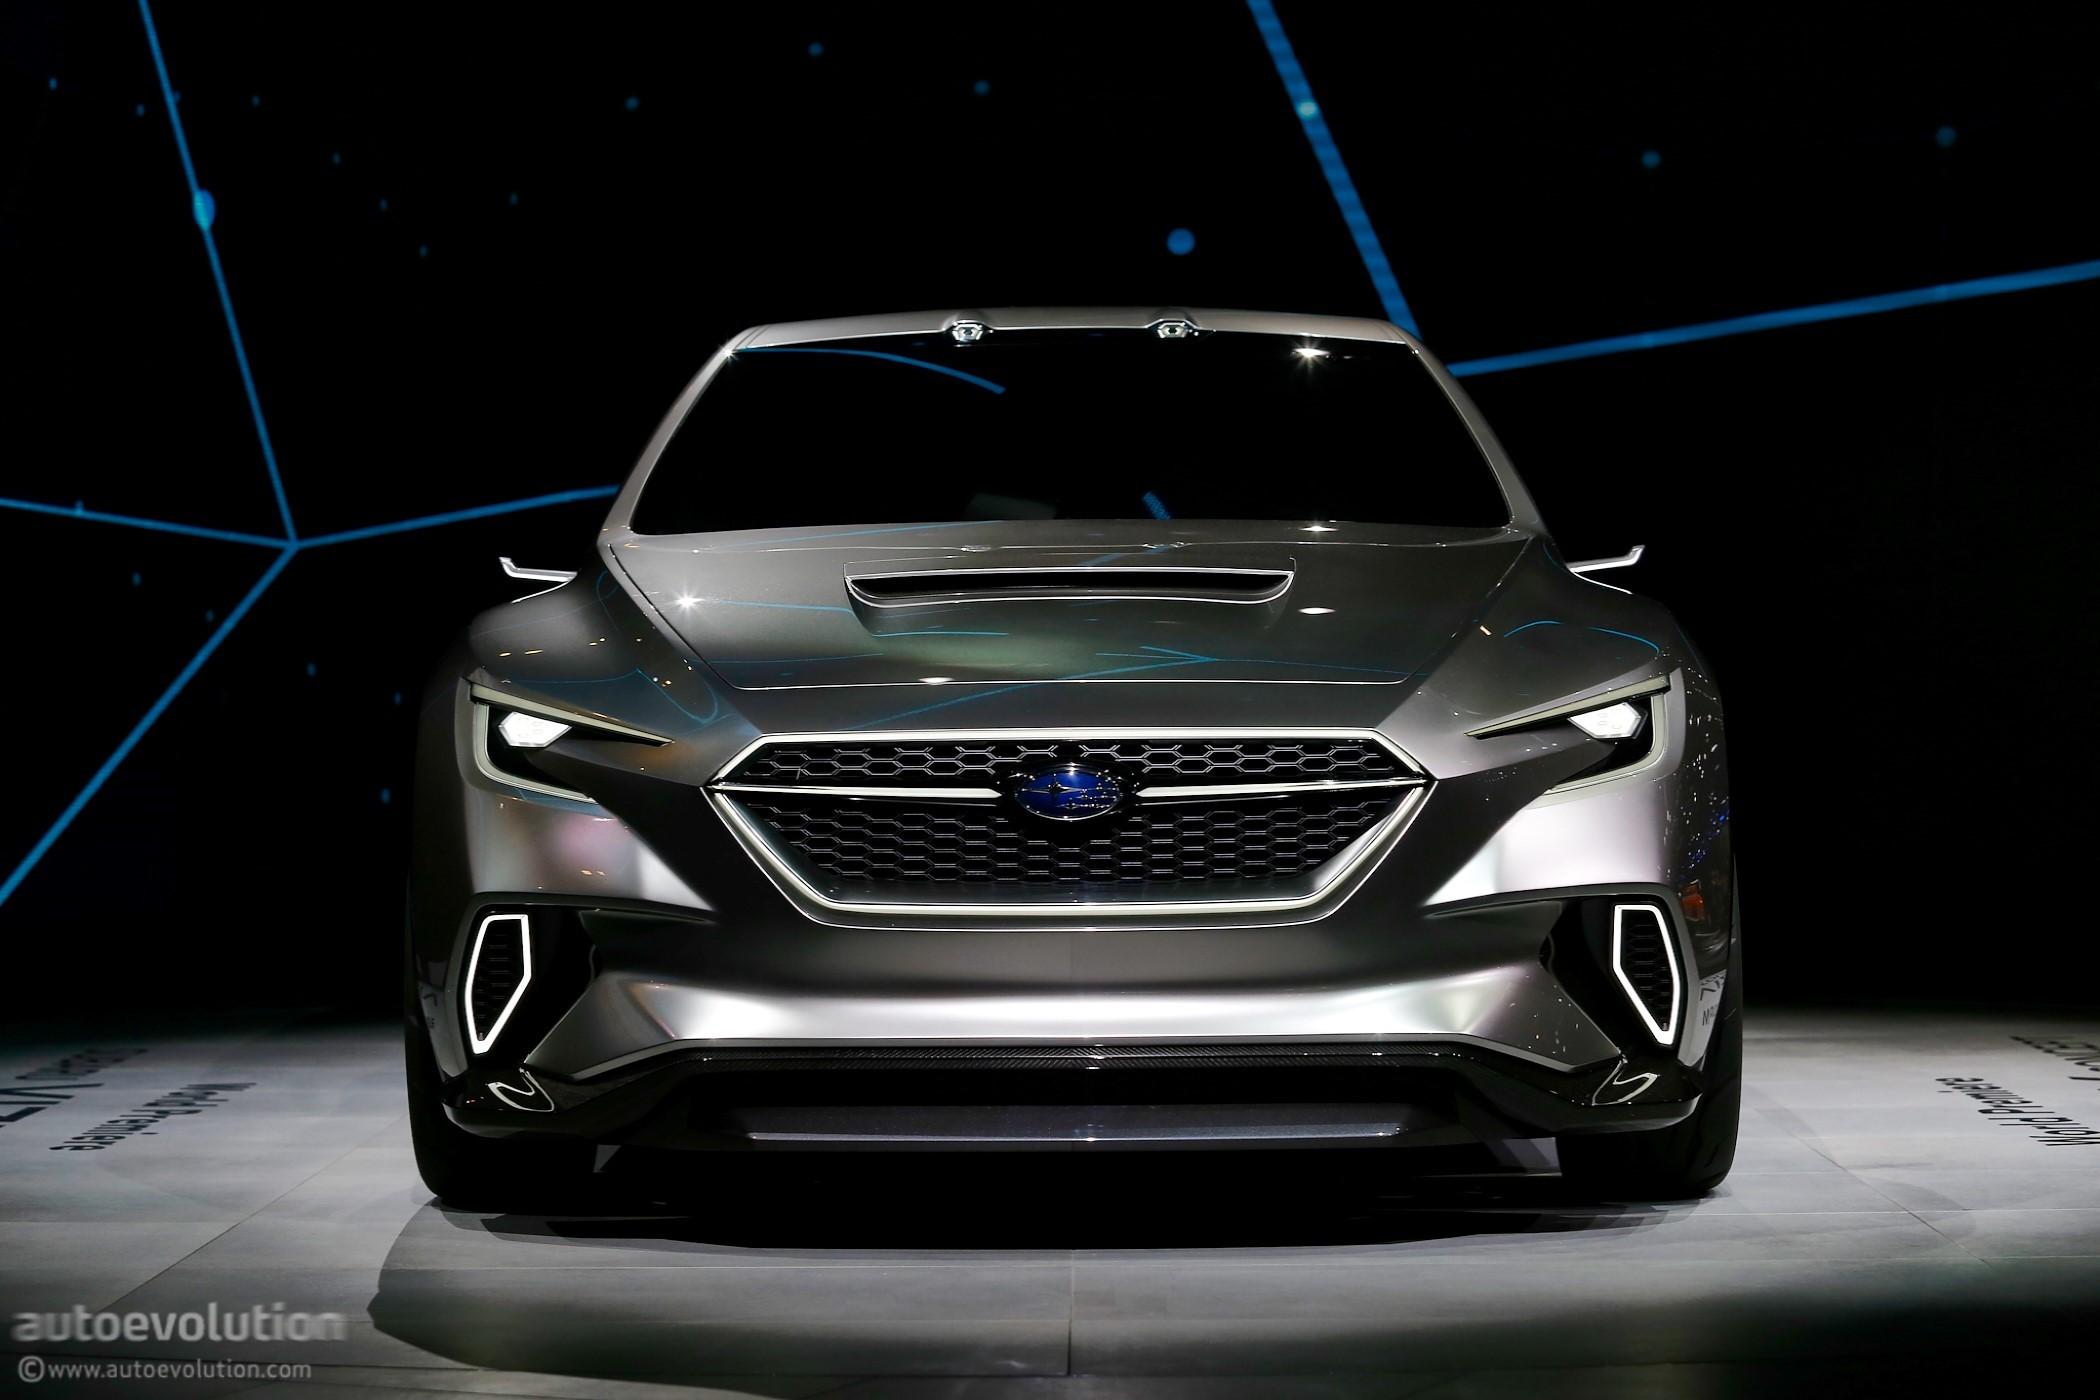 Subaru Gets Nostalgic In Geneva With Wrx Wagon Inspired Viziv Tourer Concept on 2013 Toyota Prius Part